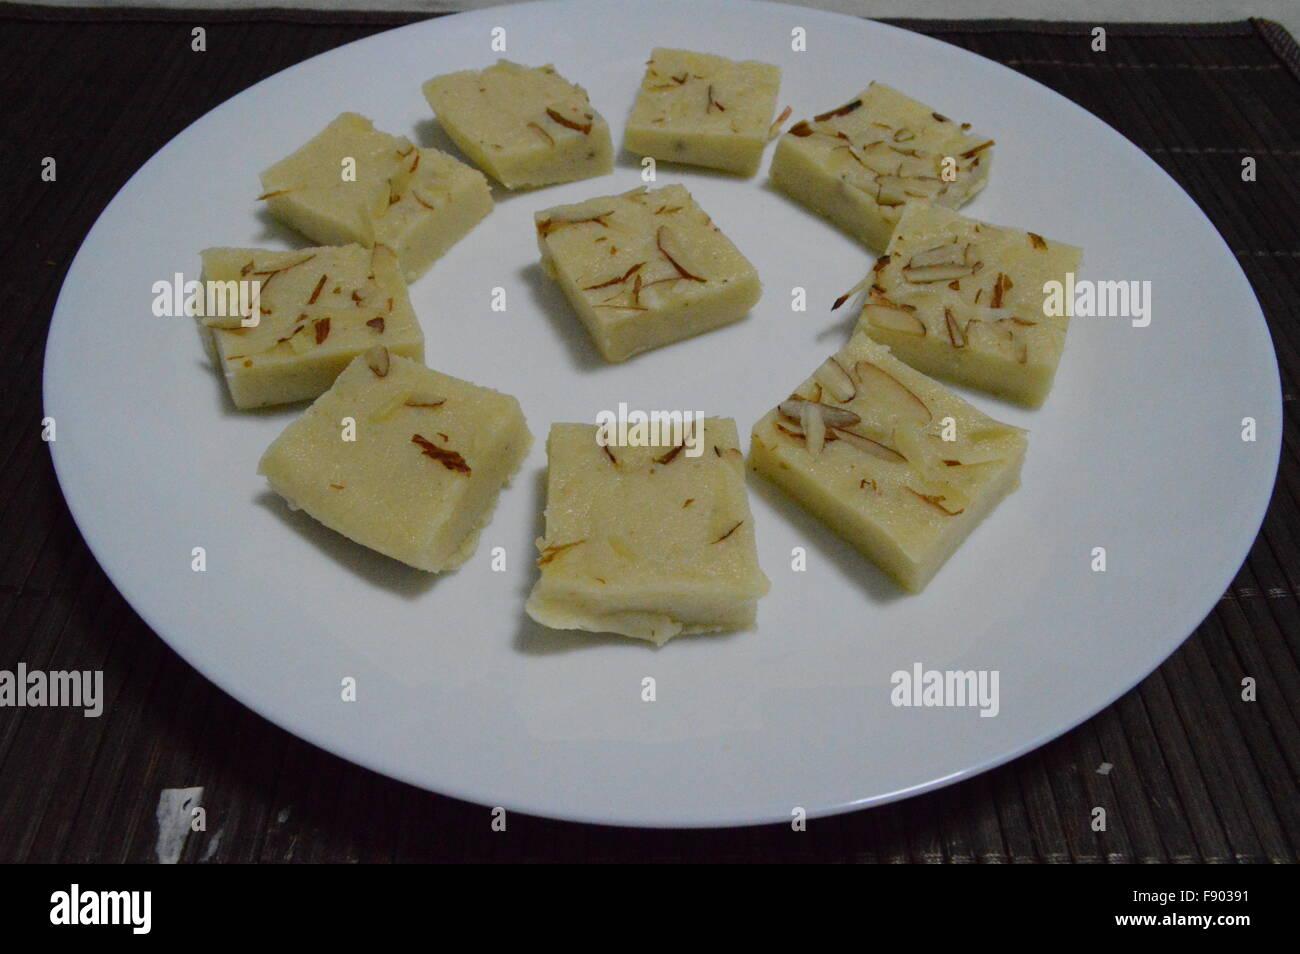 Indian food cooking paneer butter palak paneer sahi paneer stock indian food cooking paneer butter palak paneer sahi paneer paneer tikka kheer samosa pakora aaloo tikki forumfinder Choice Image